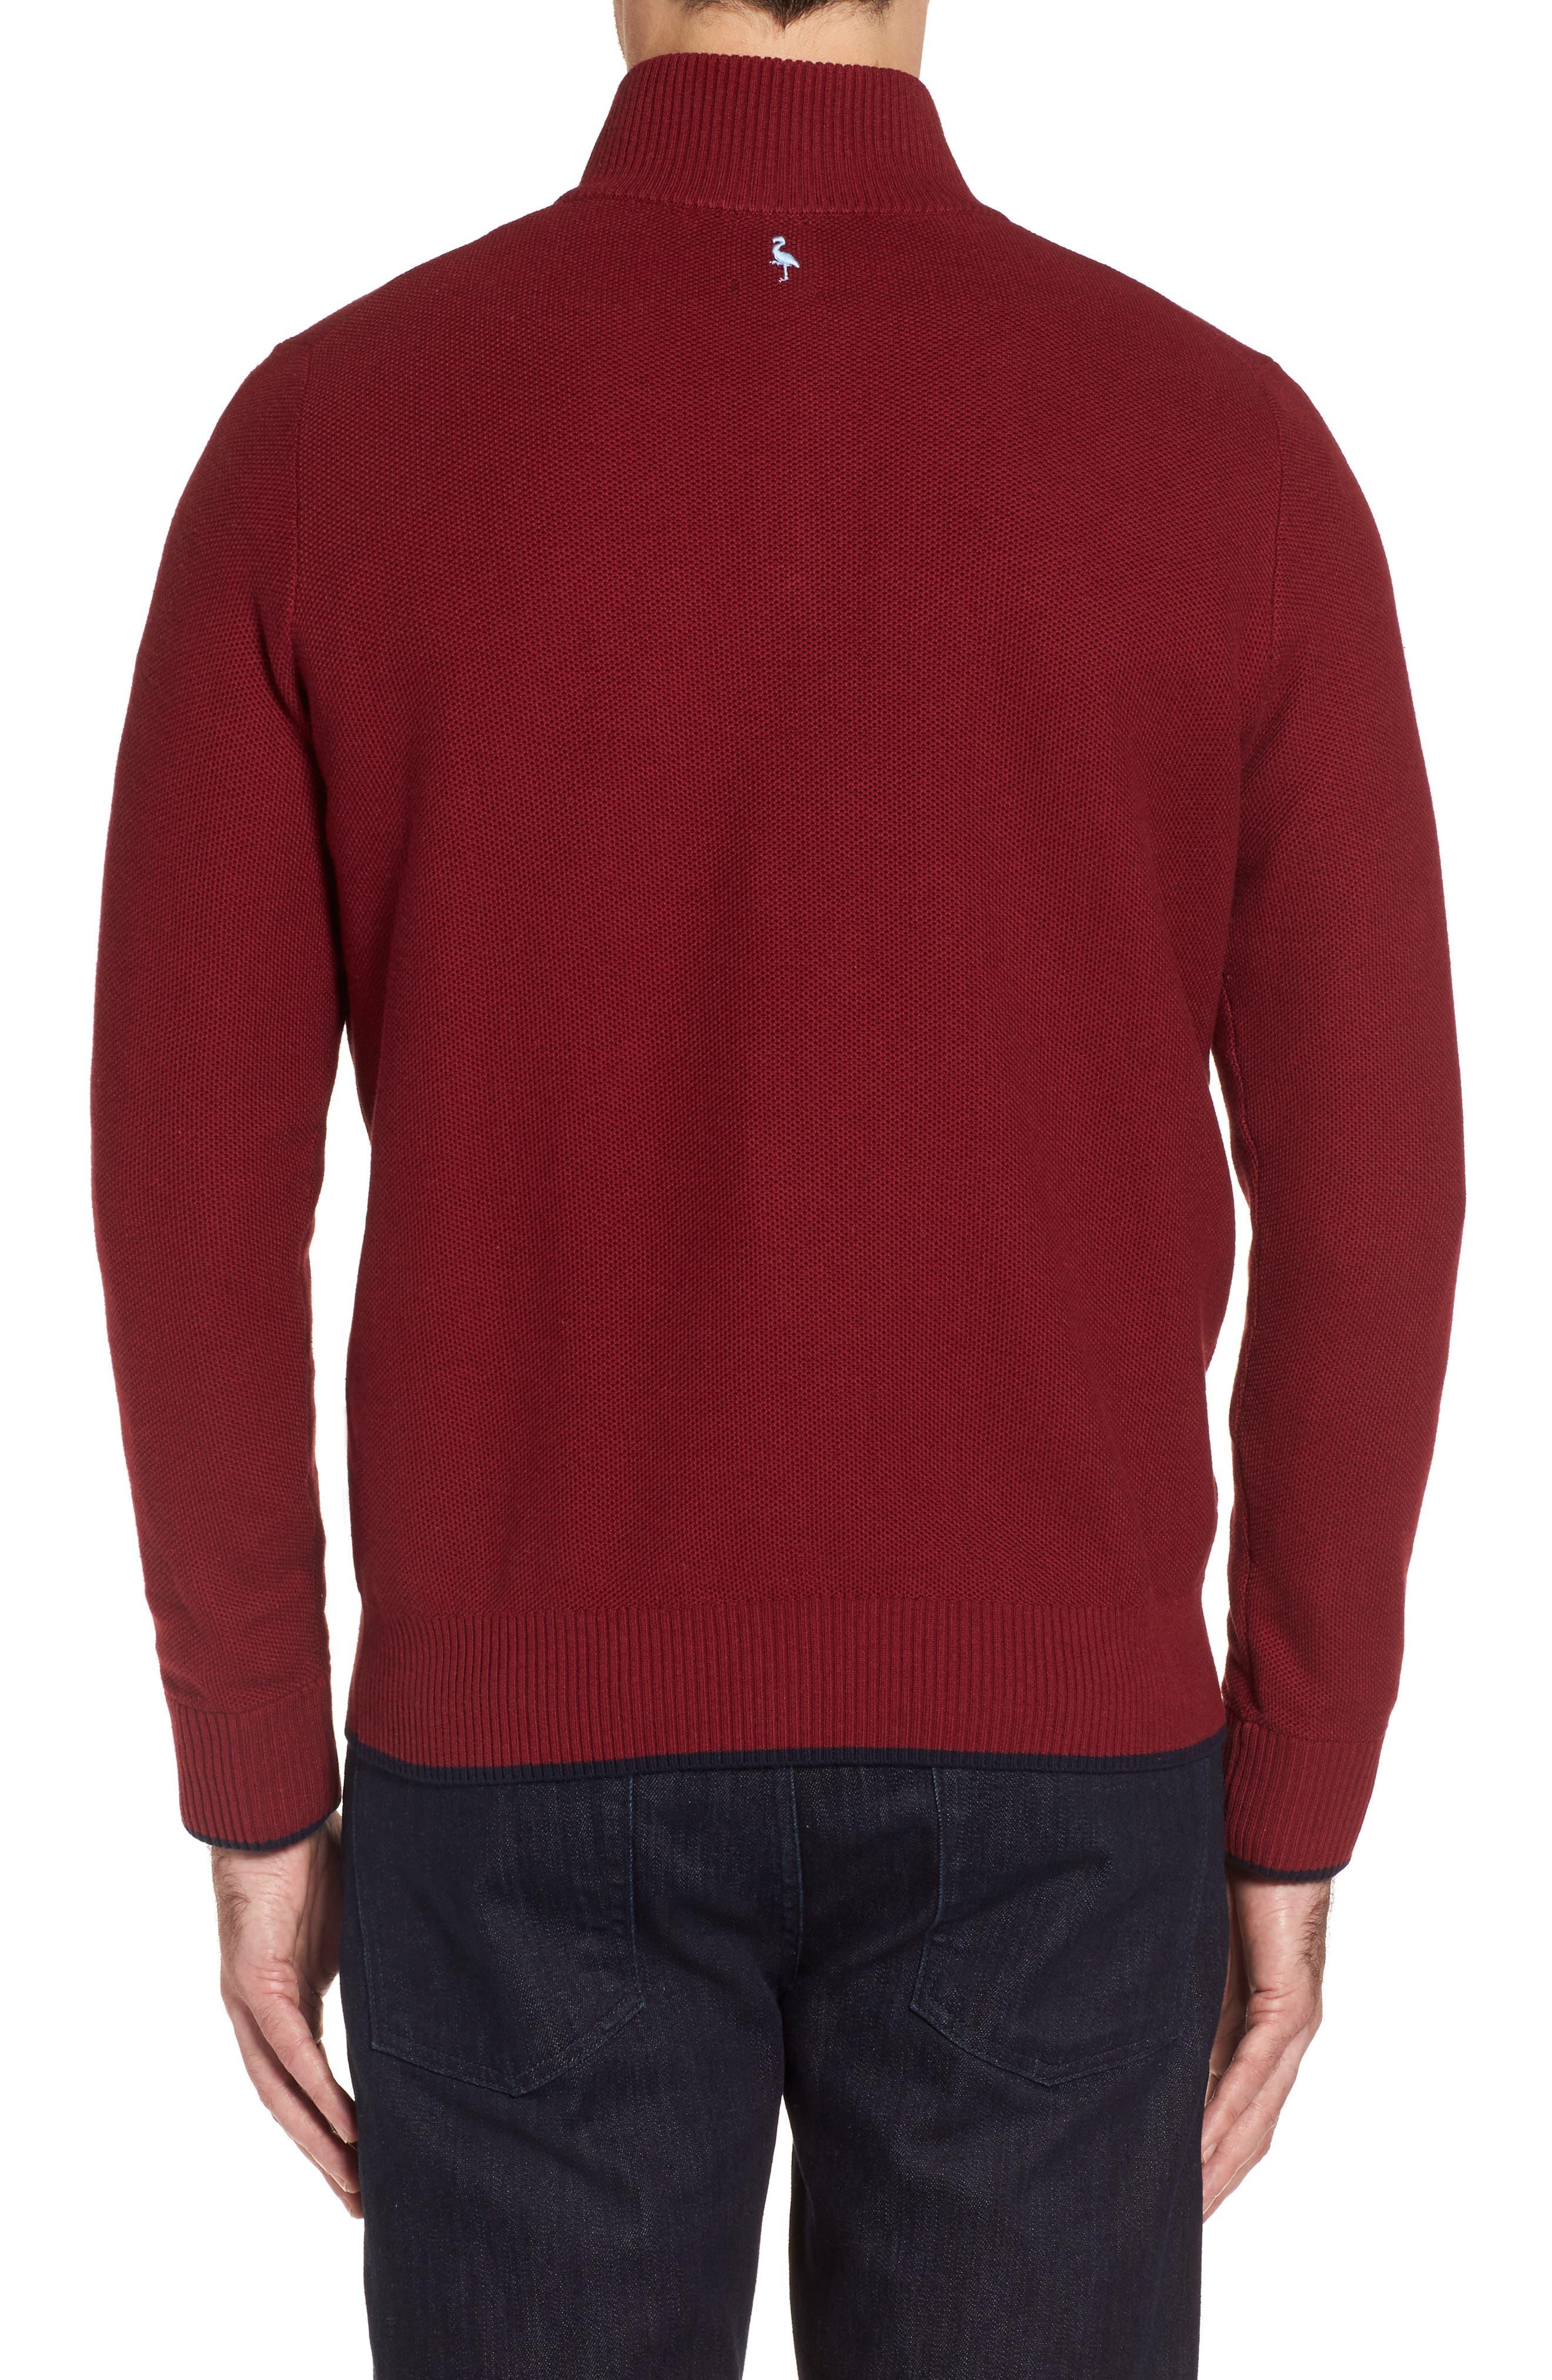 Alternate Image 2  - TailorByrd Prien Tipped Quarter Zip Sweater